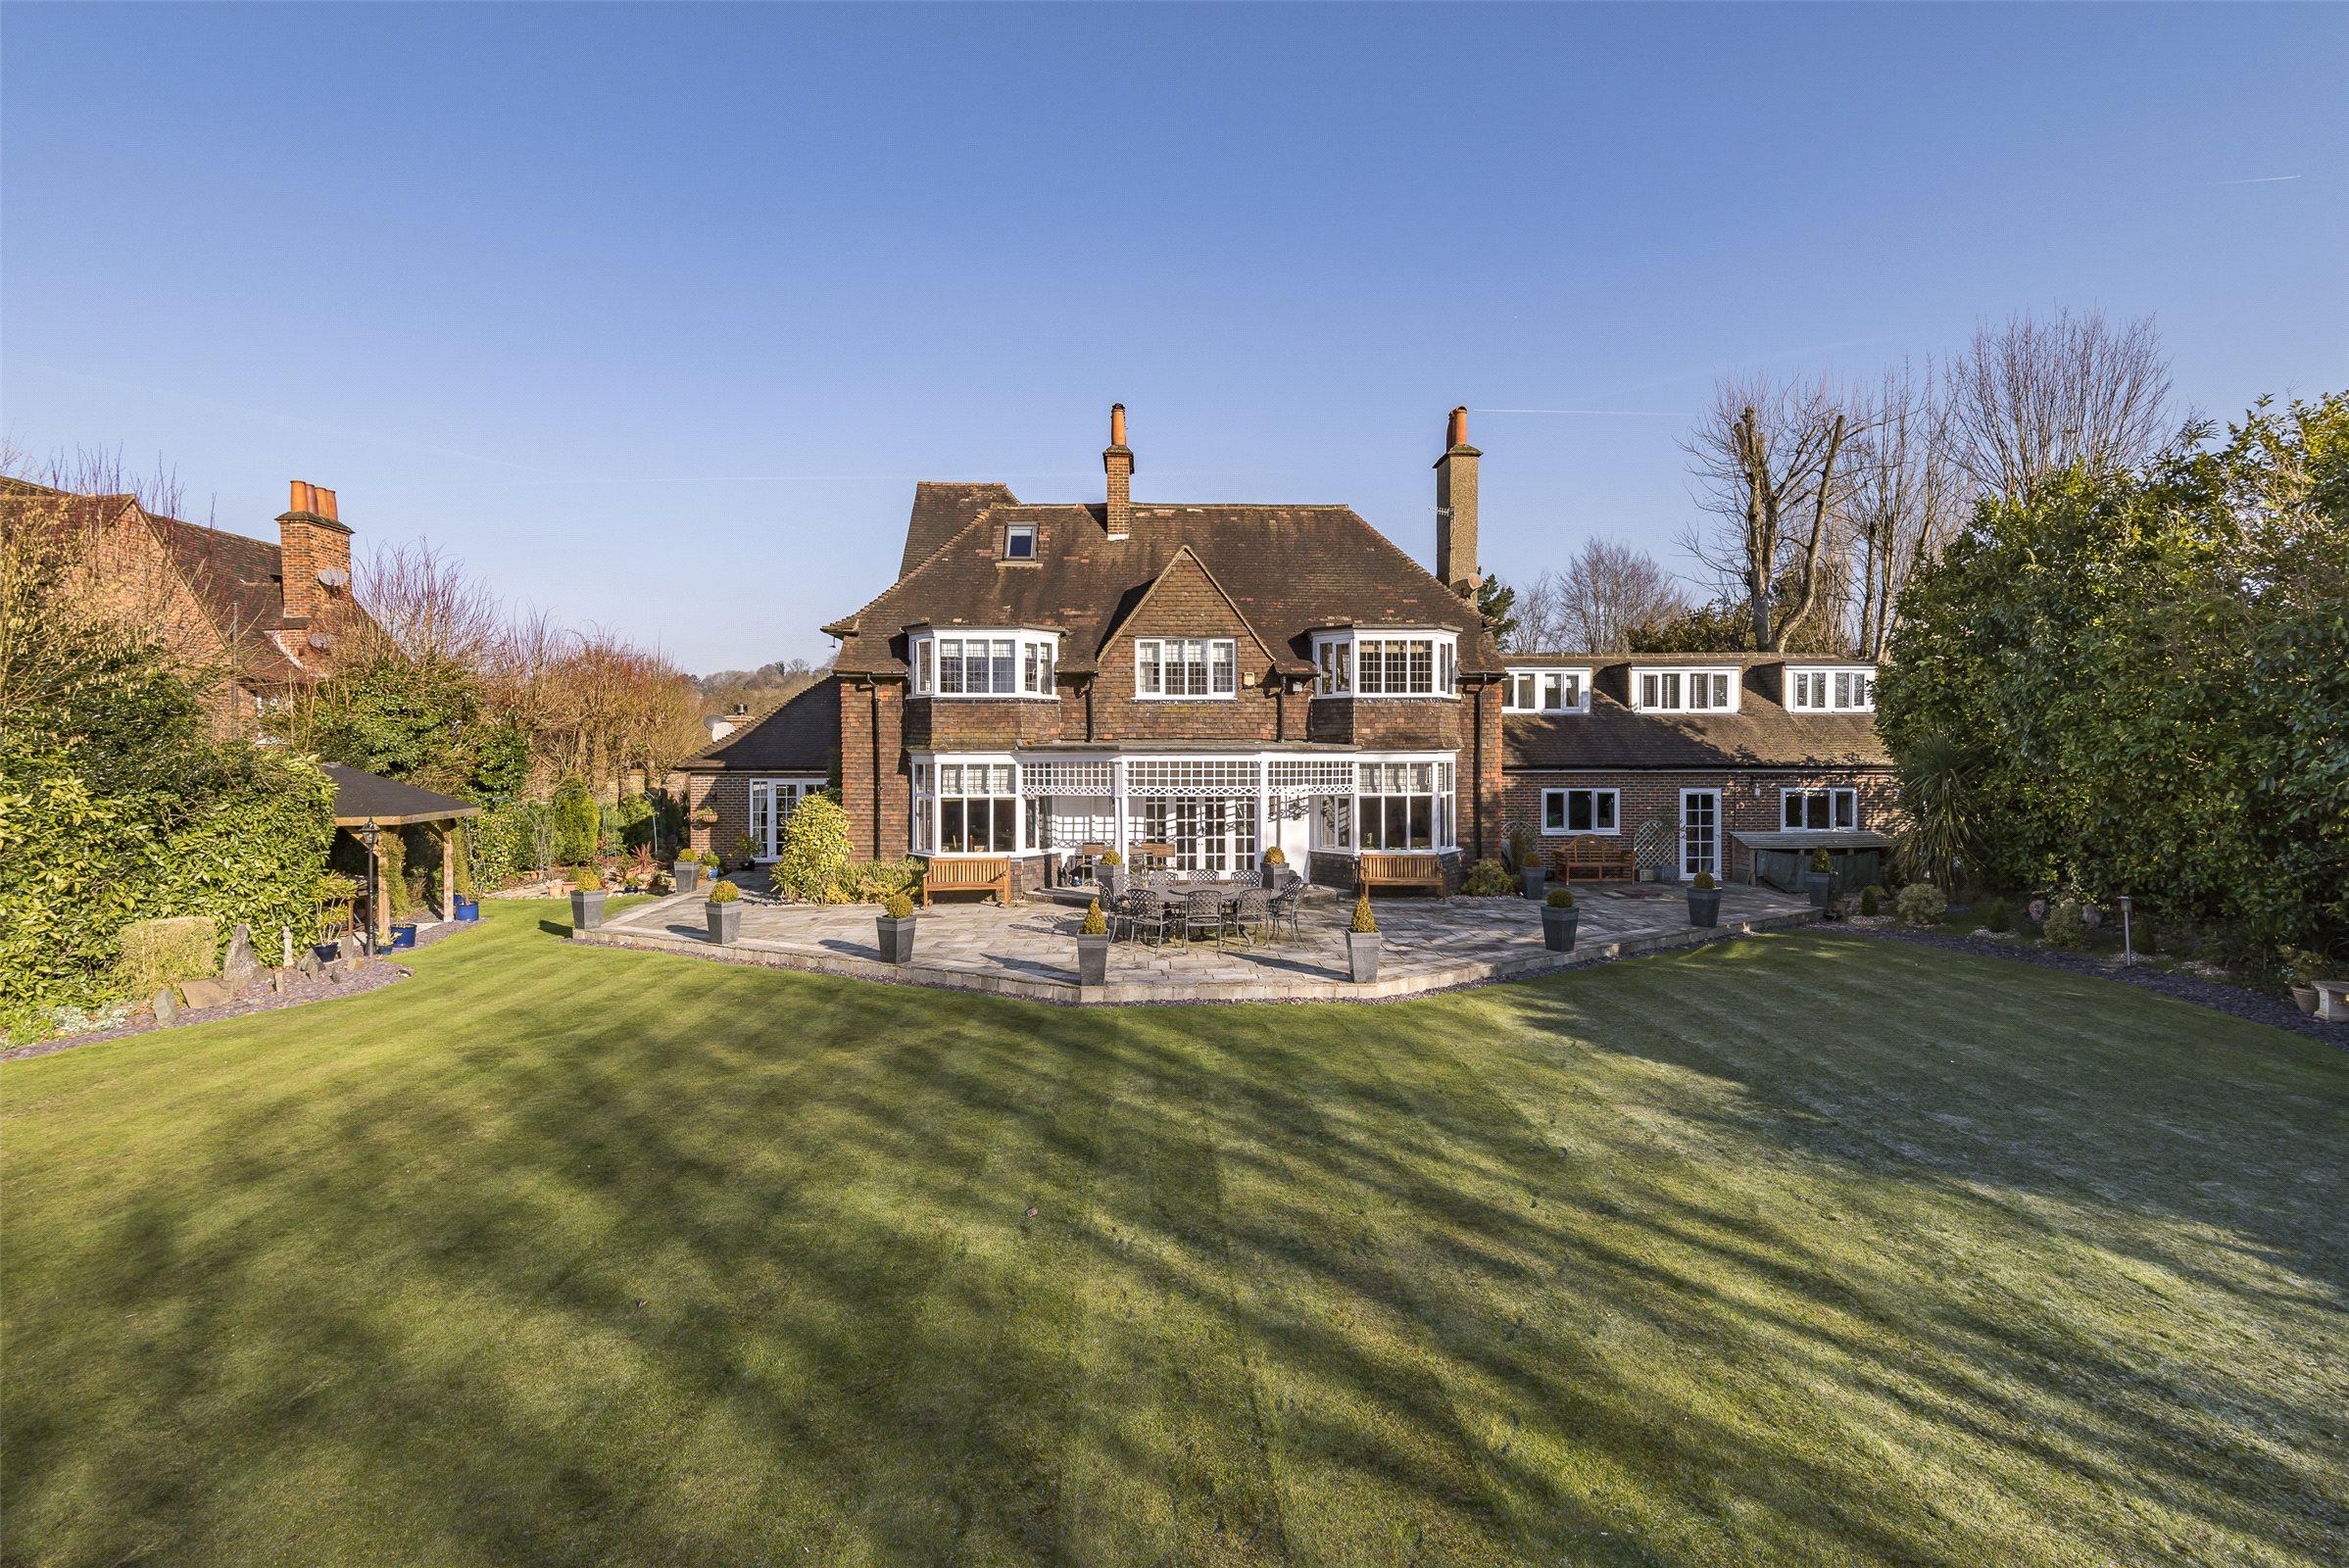 5 Bedroom Property For Sale In Rockshaw Road, Merstham, Redhill,